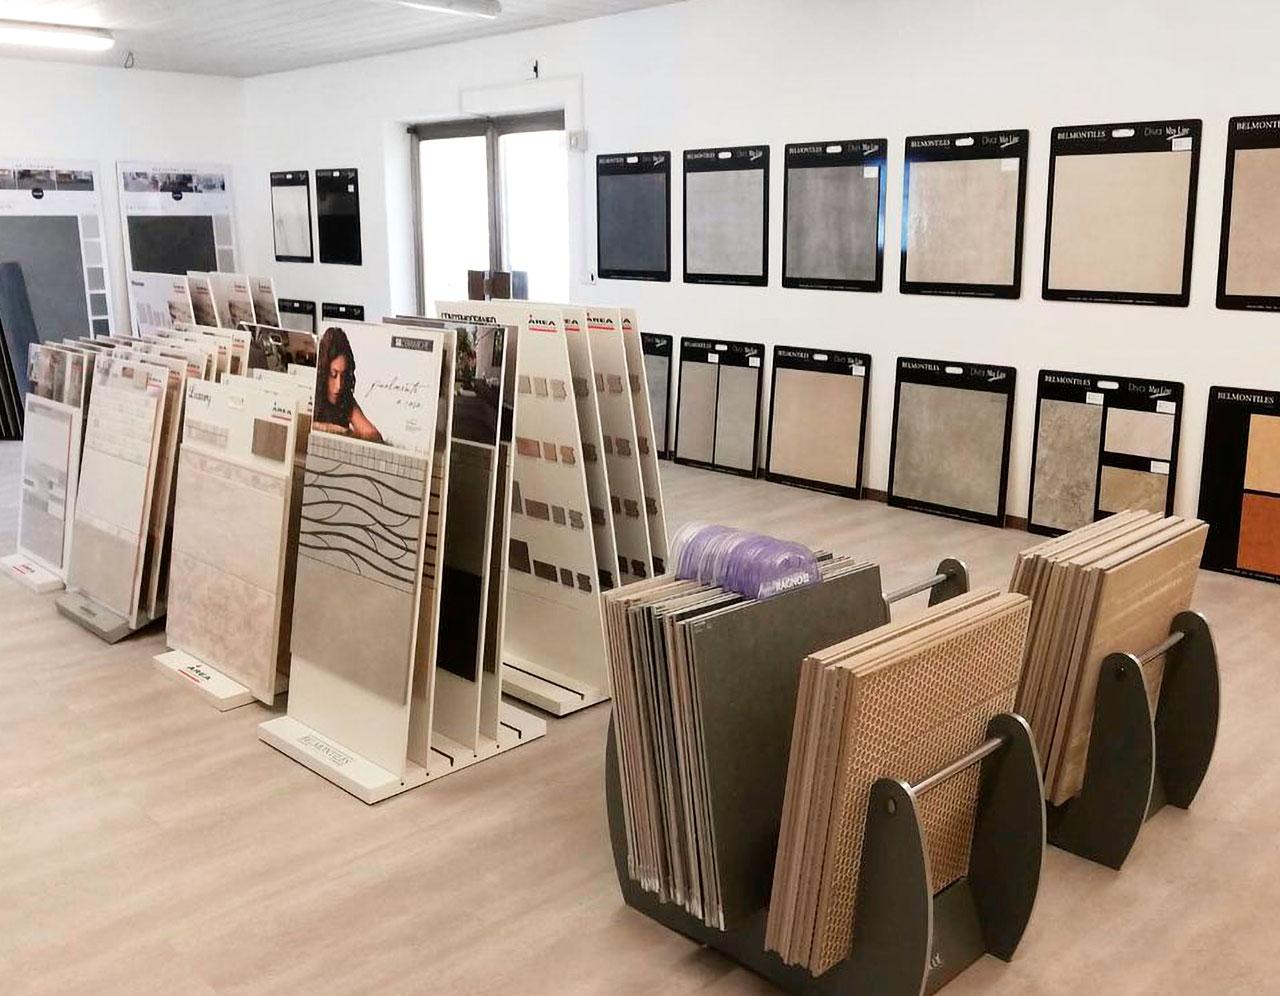 Niederkofler Bau, Kontakt, Ausstellung, Trens, Freienfeld, 2021-04, 1280x996px